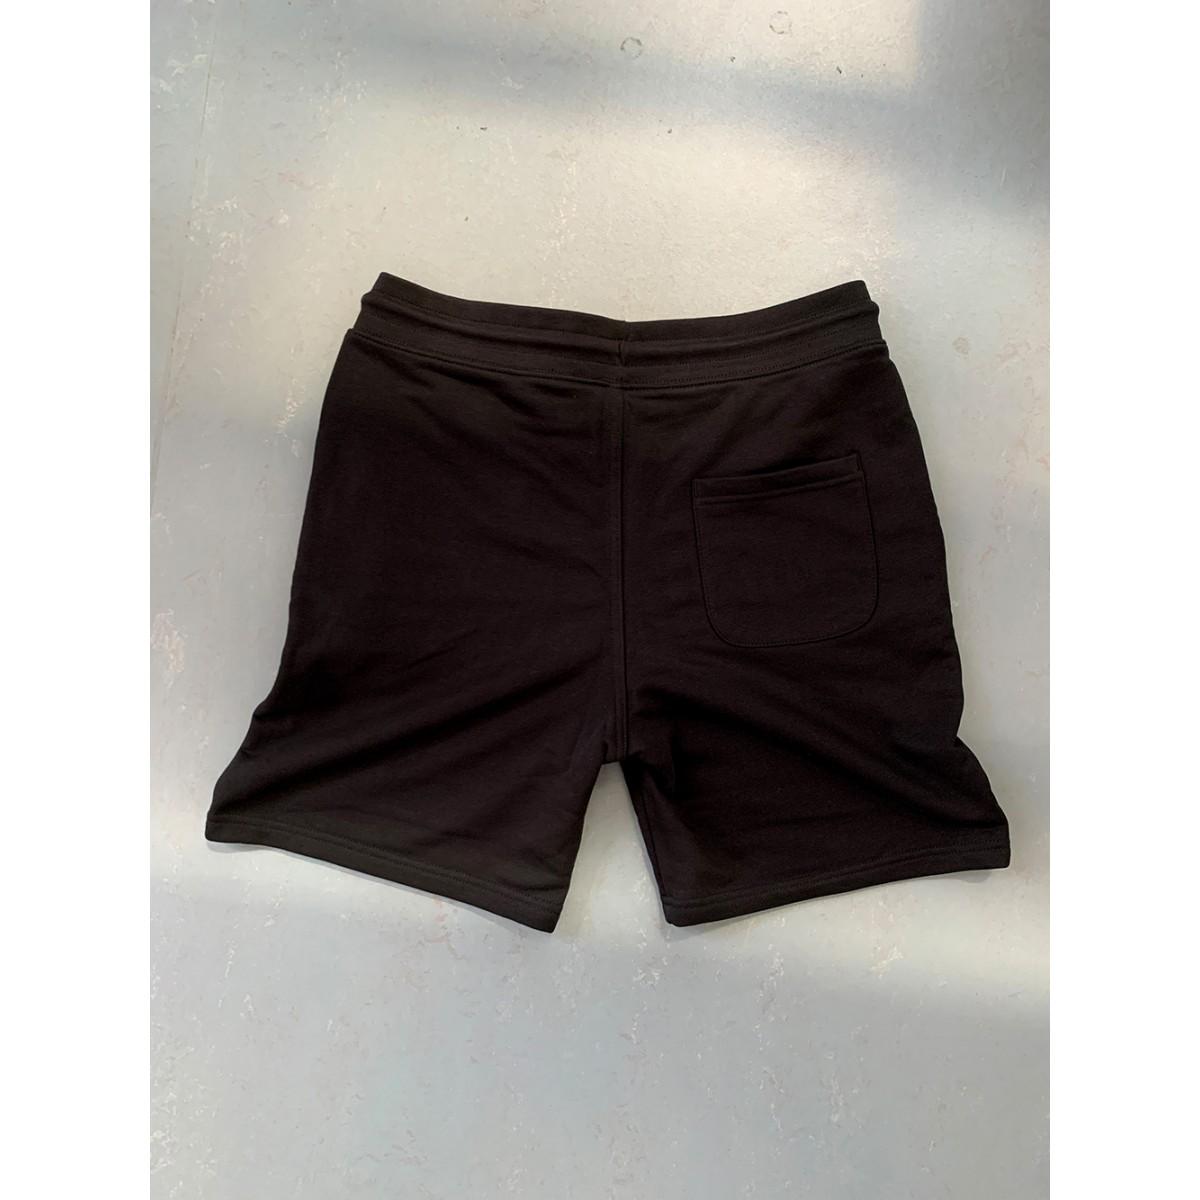 hey hey x why ebay Shorts (Limited Edition)